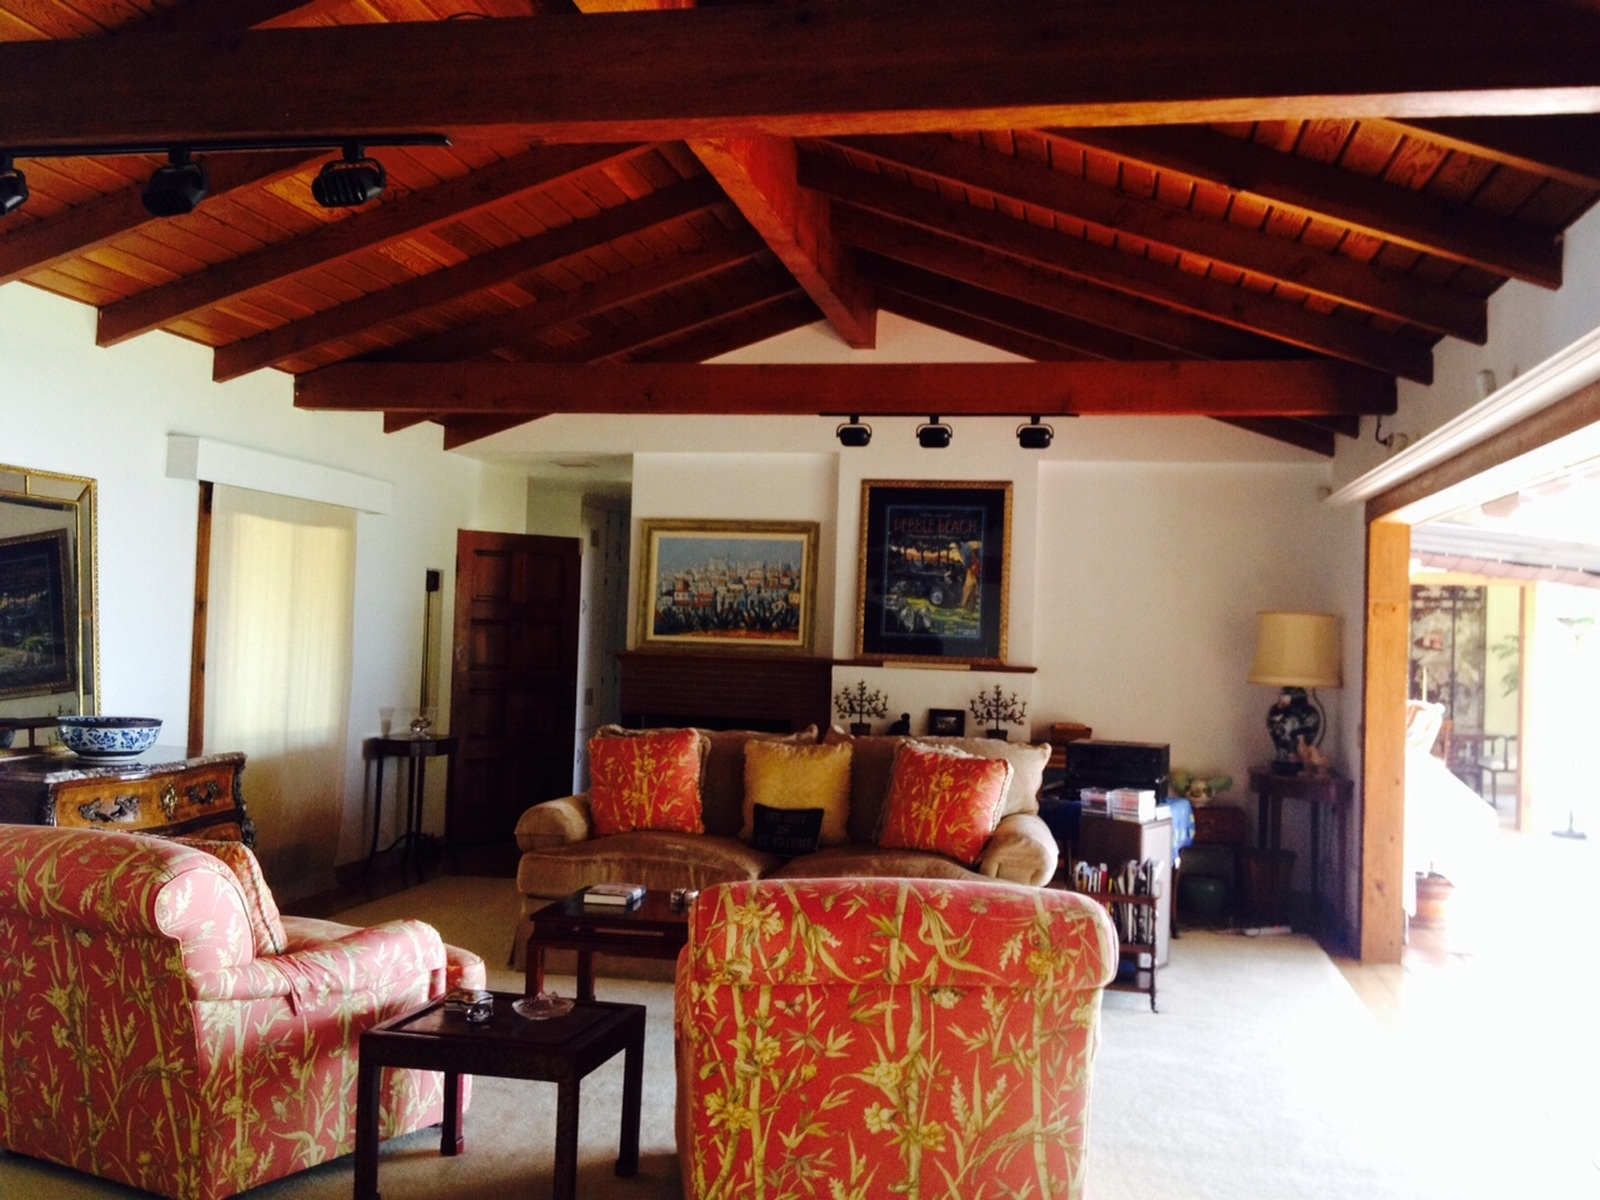 Single Family Home for Sale at 20548 Pinnacle Way Malibu, California 90265 United States